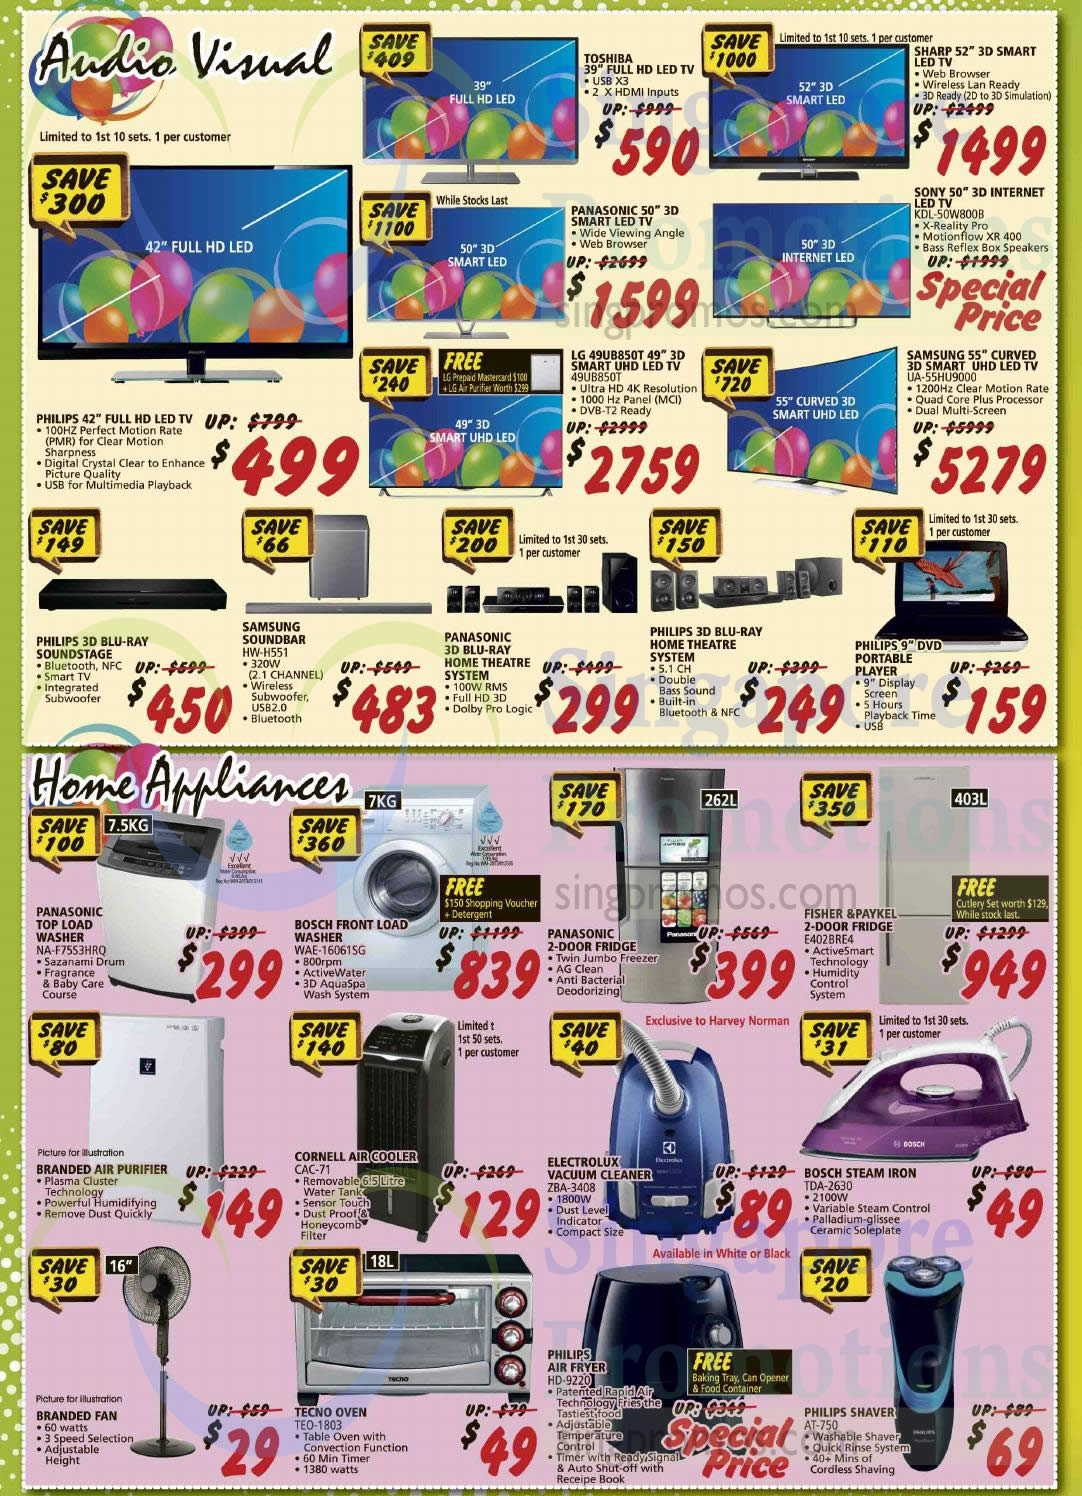 Audio Visual Home Appliances Toshiba Sharp Sony